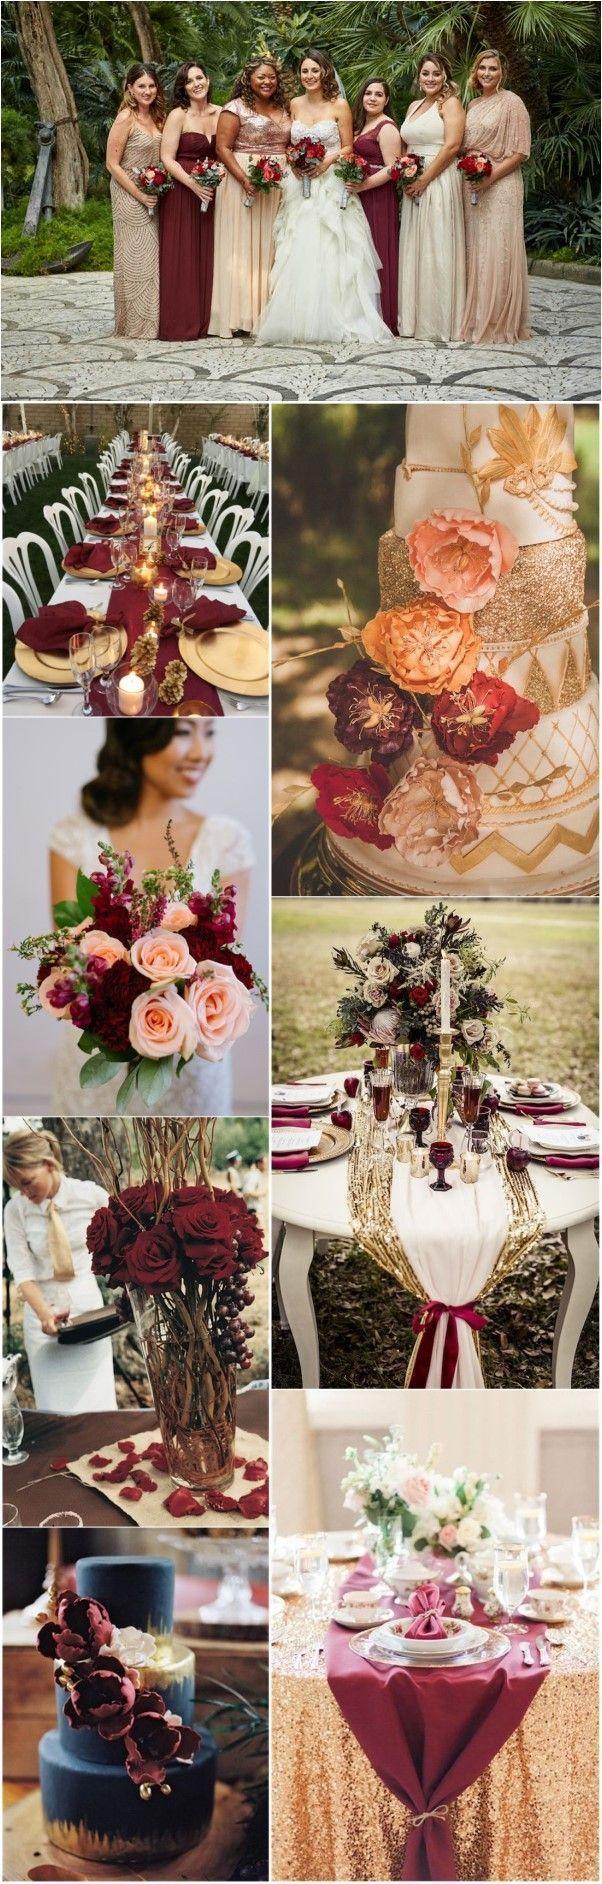 22 Romantic Burgundy and Rose Gold Fall Wedding Ideas | Pinterest ...